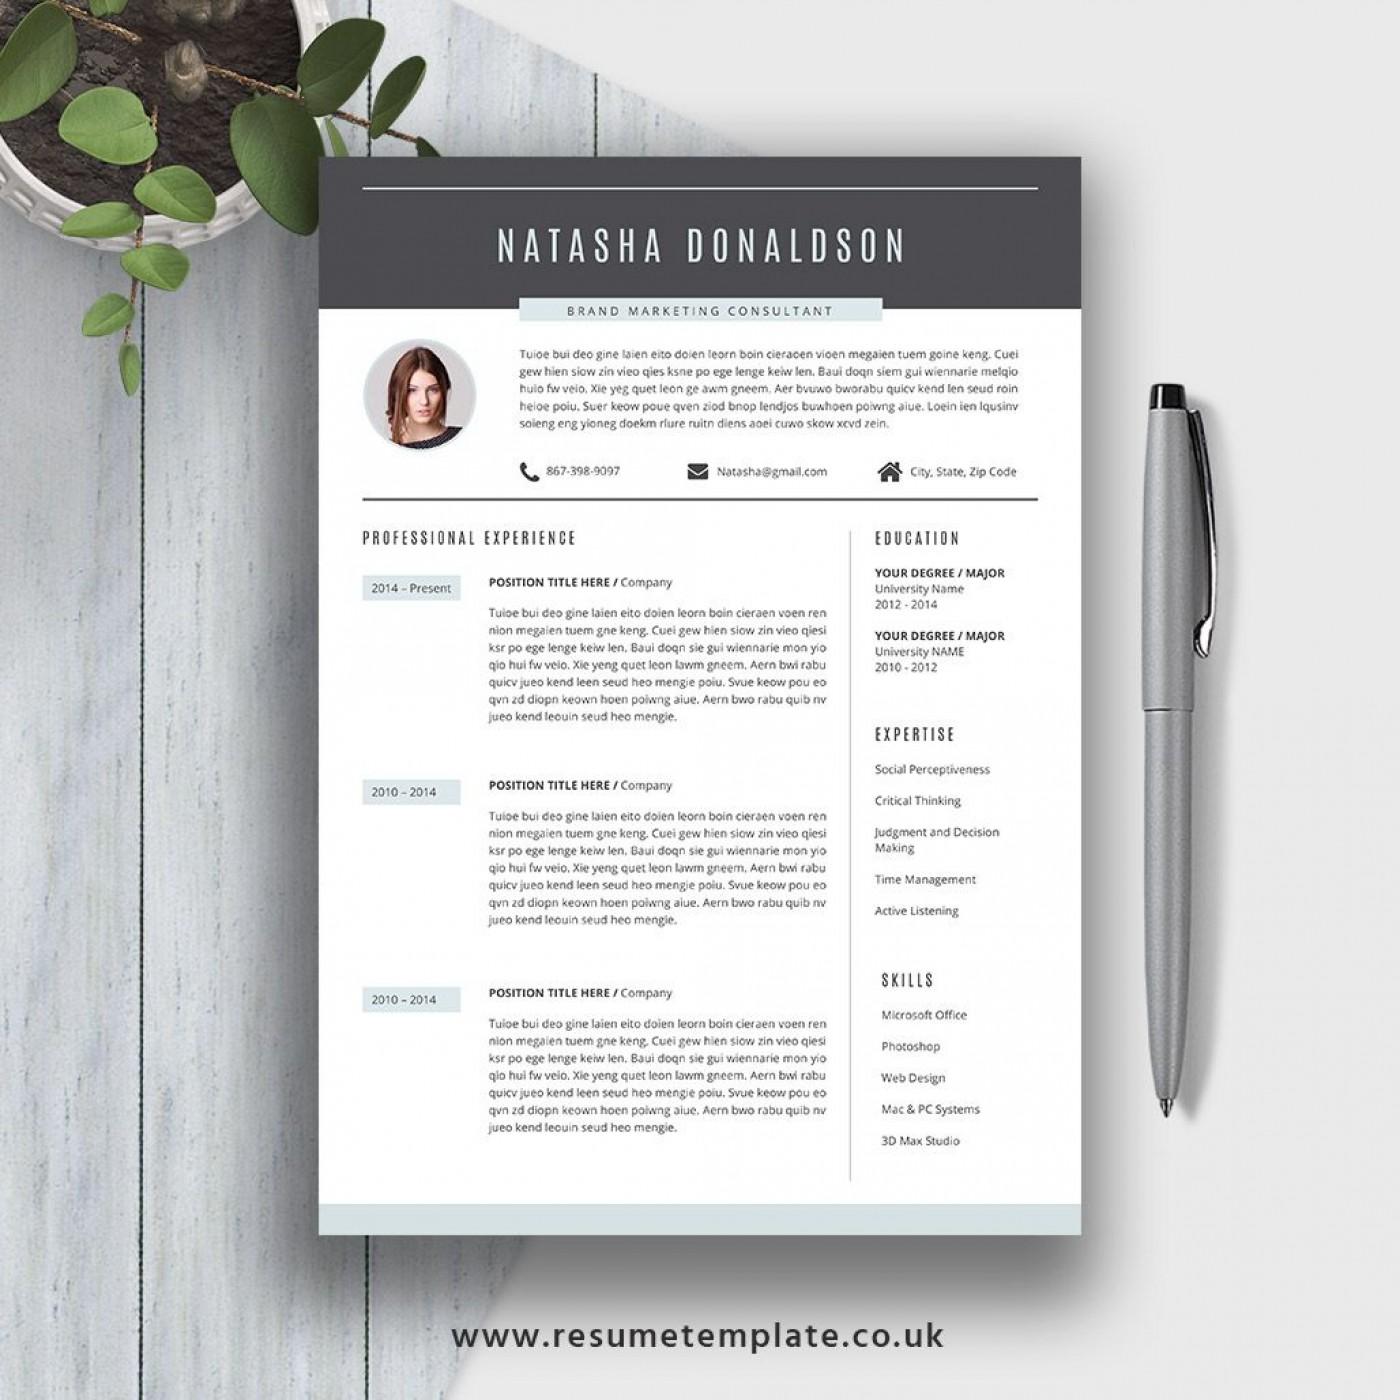 007 Fantastic Resume Template M Word 2020 Photo  Free Microsoft1400